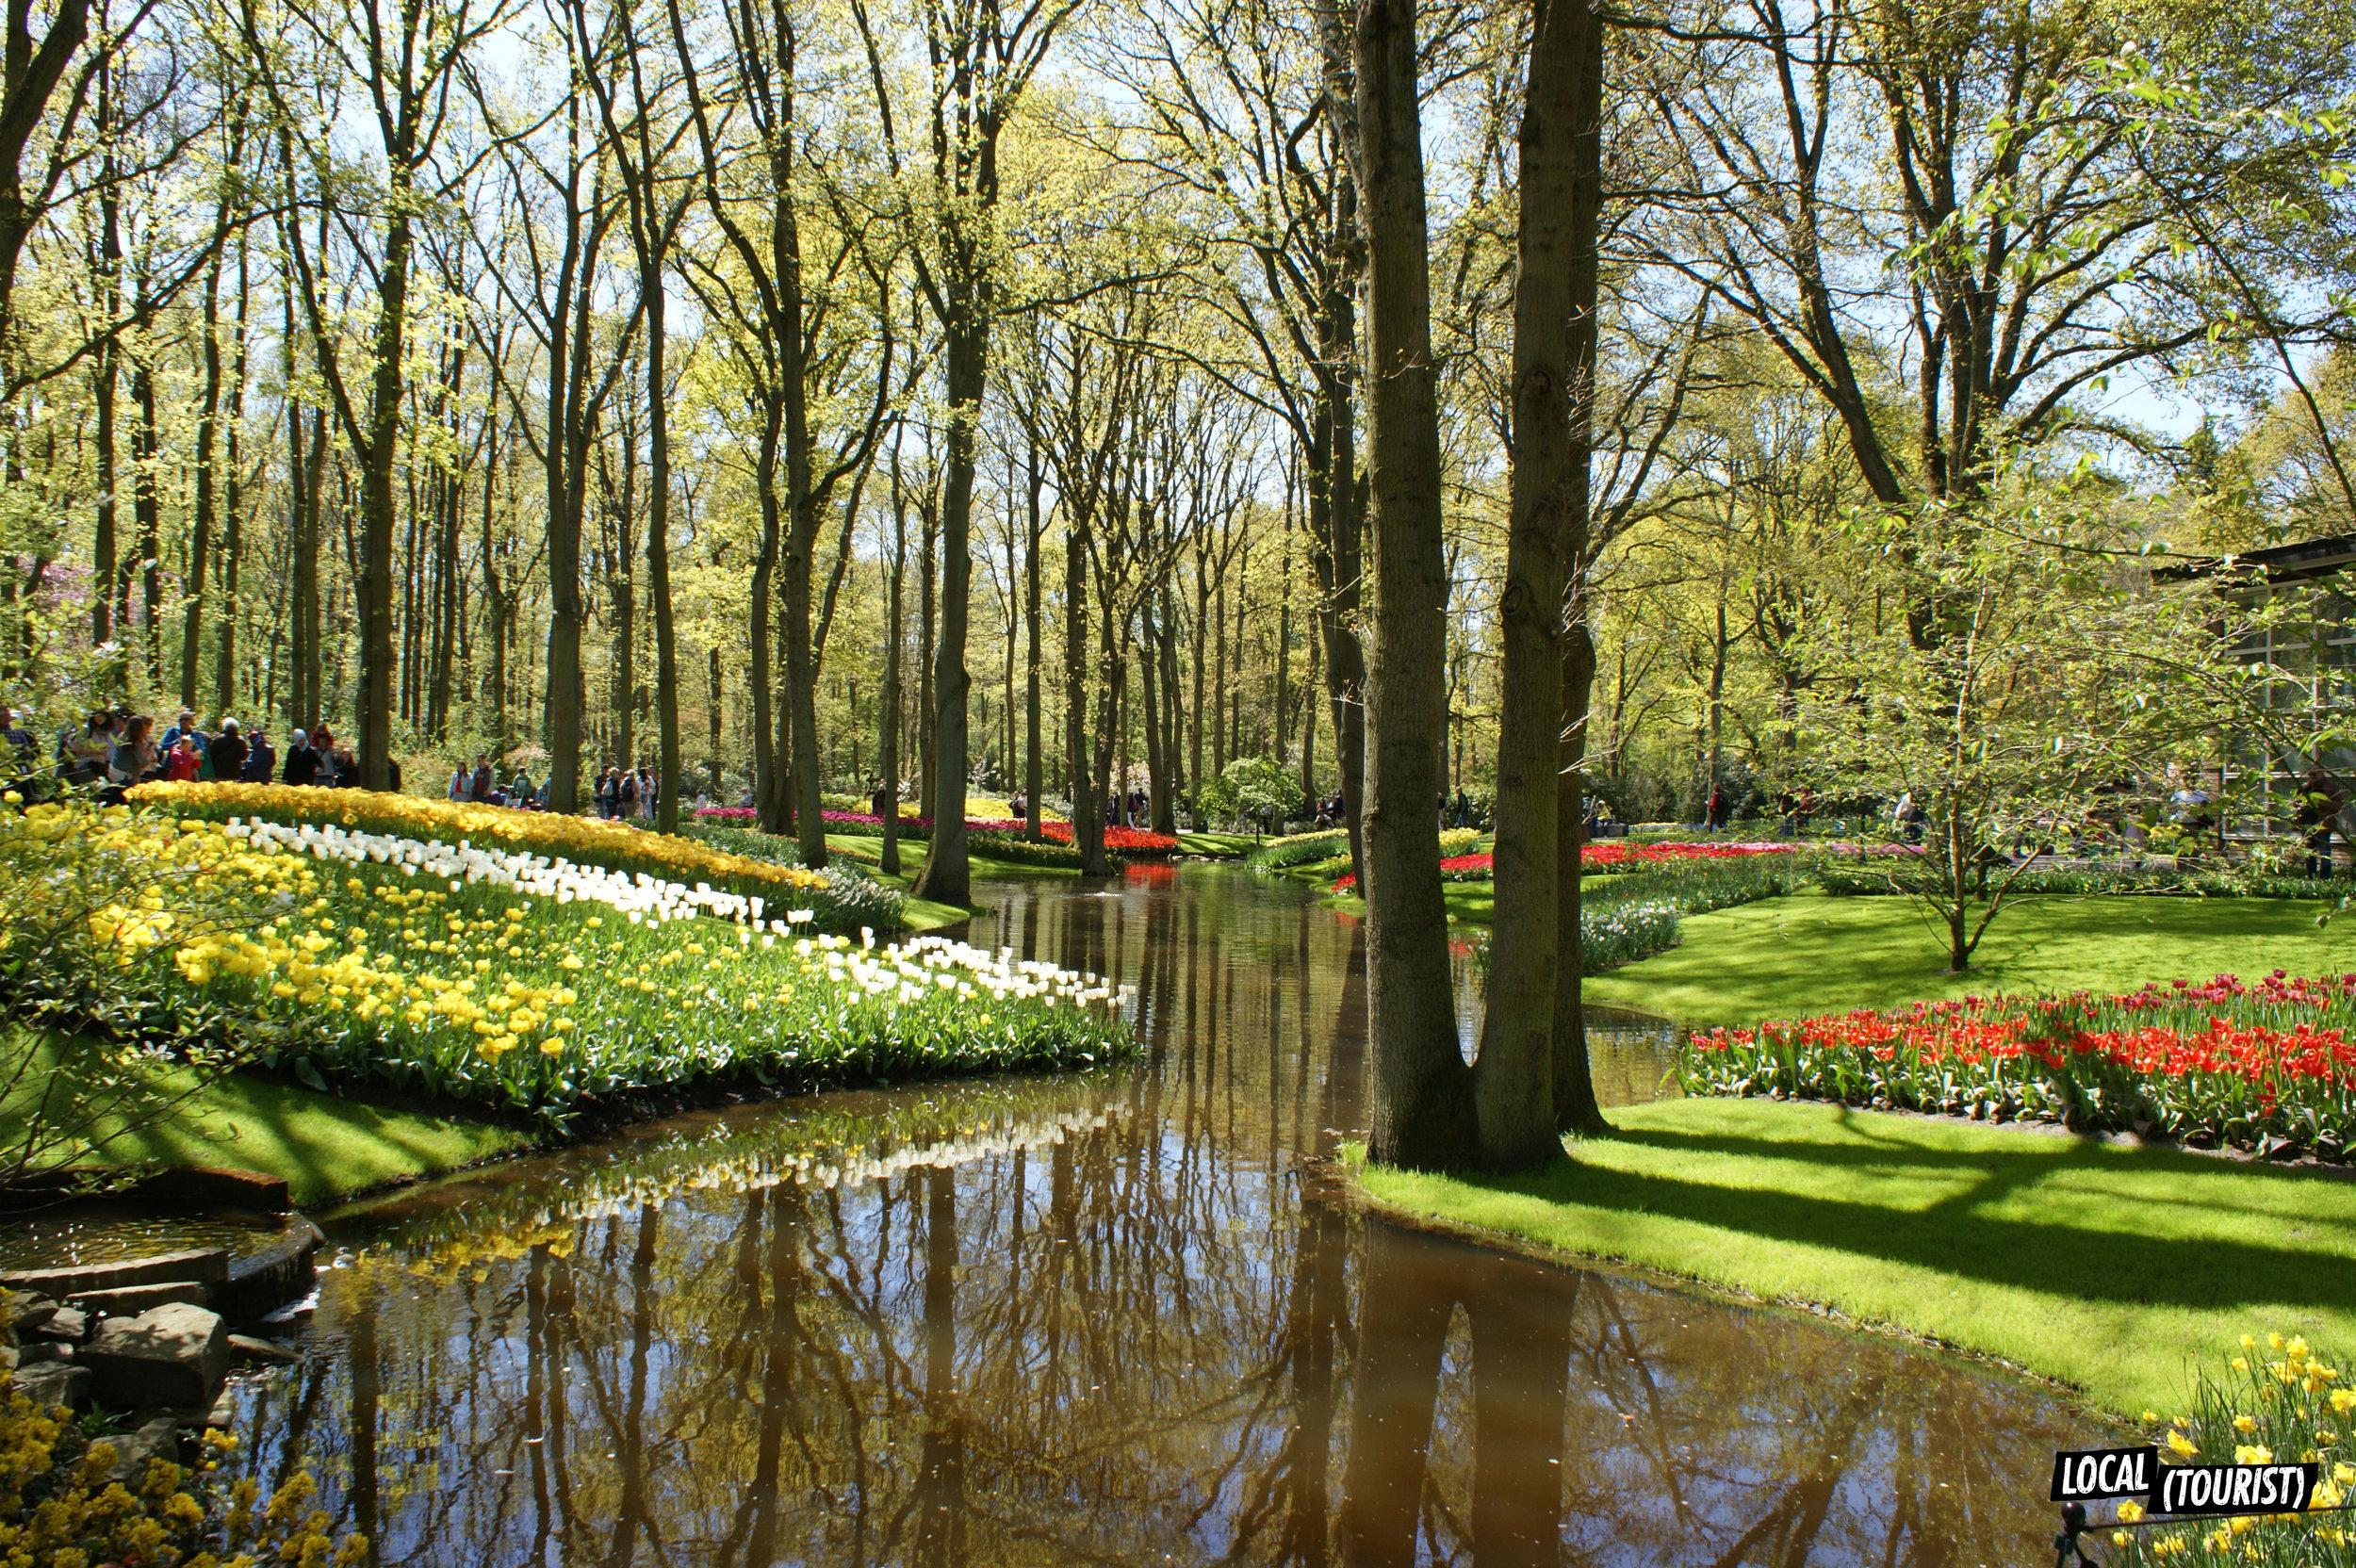 Keukenhof Gardens / Lisse, The Netherlands / img via Local (Tourist)